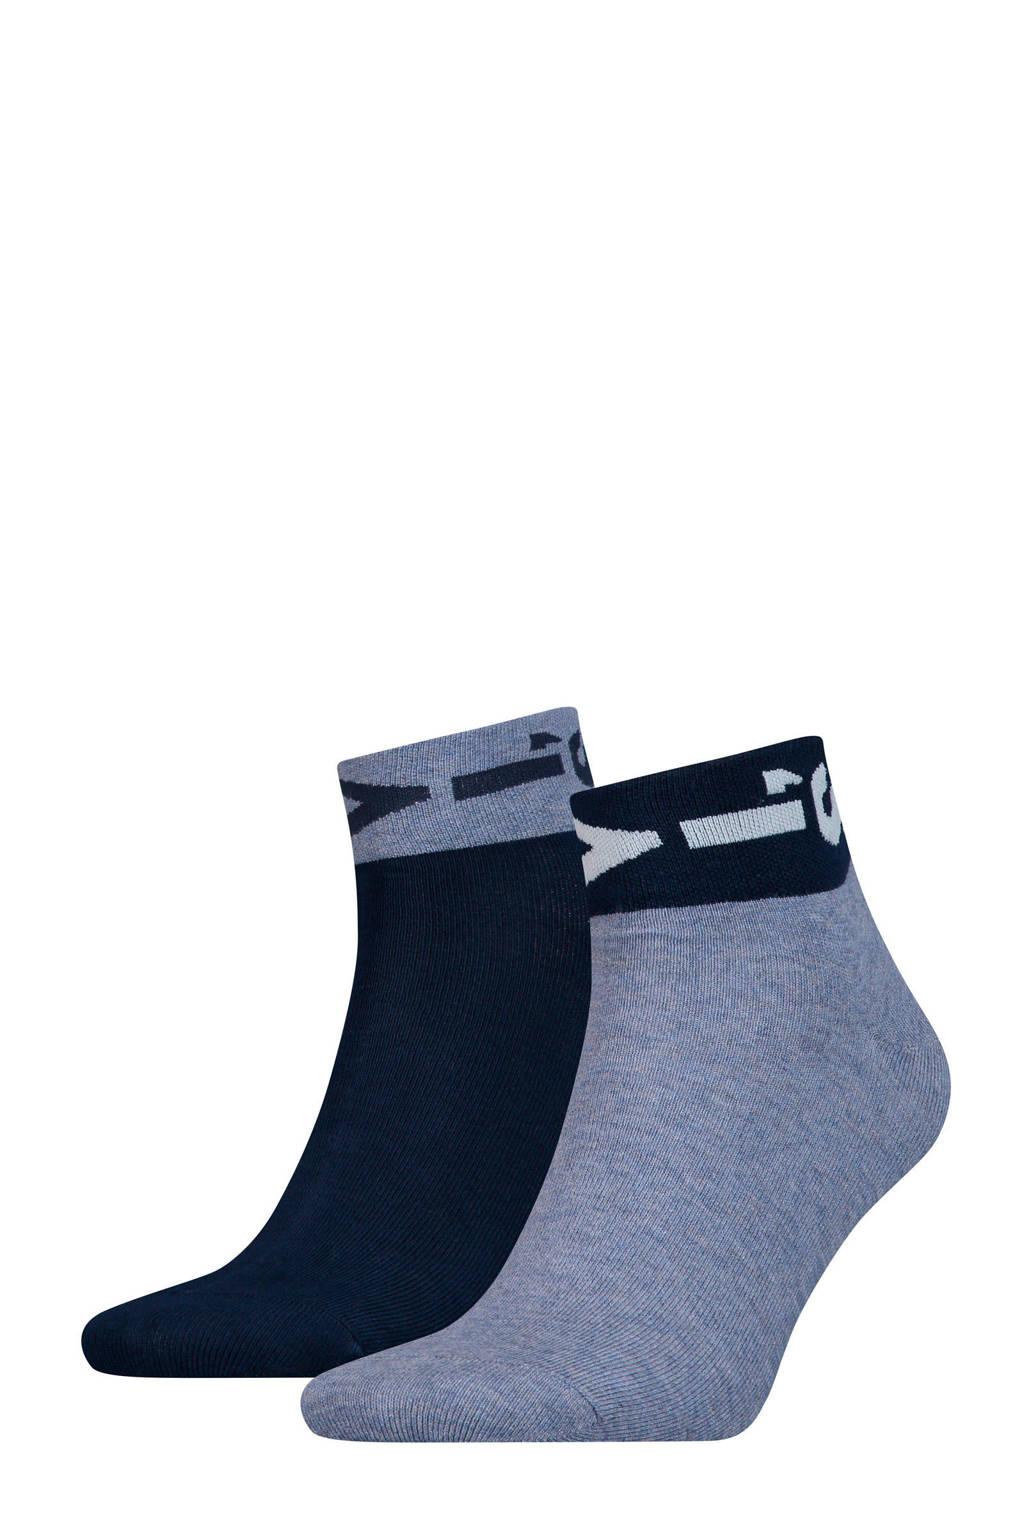 Levi's sokken met logoprint blauw, Blauw/marine/wit